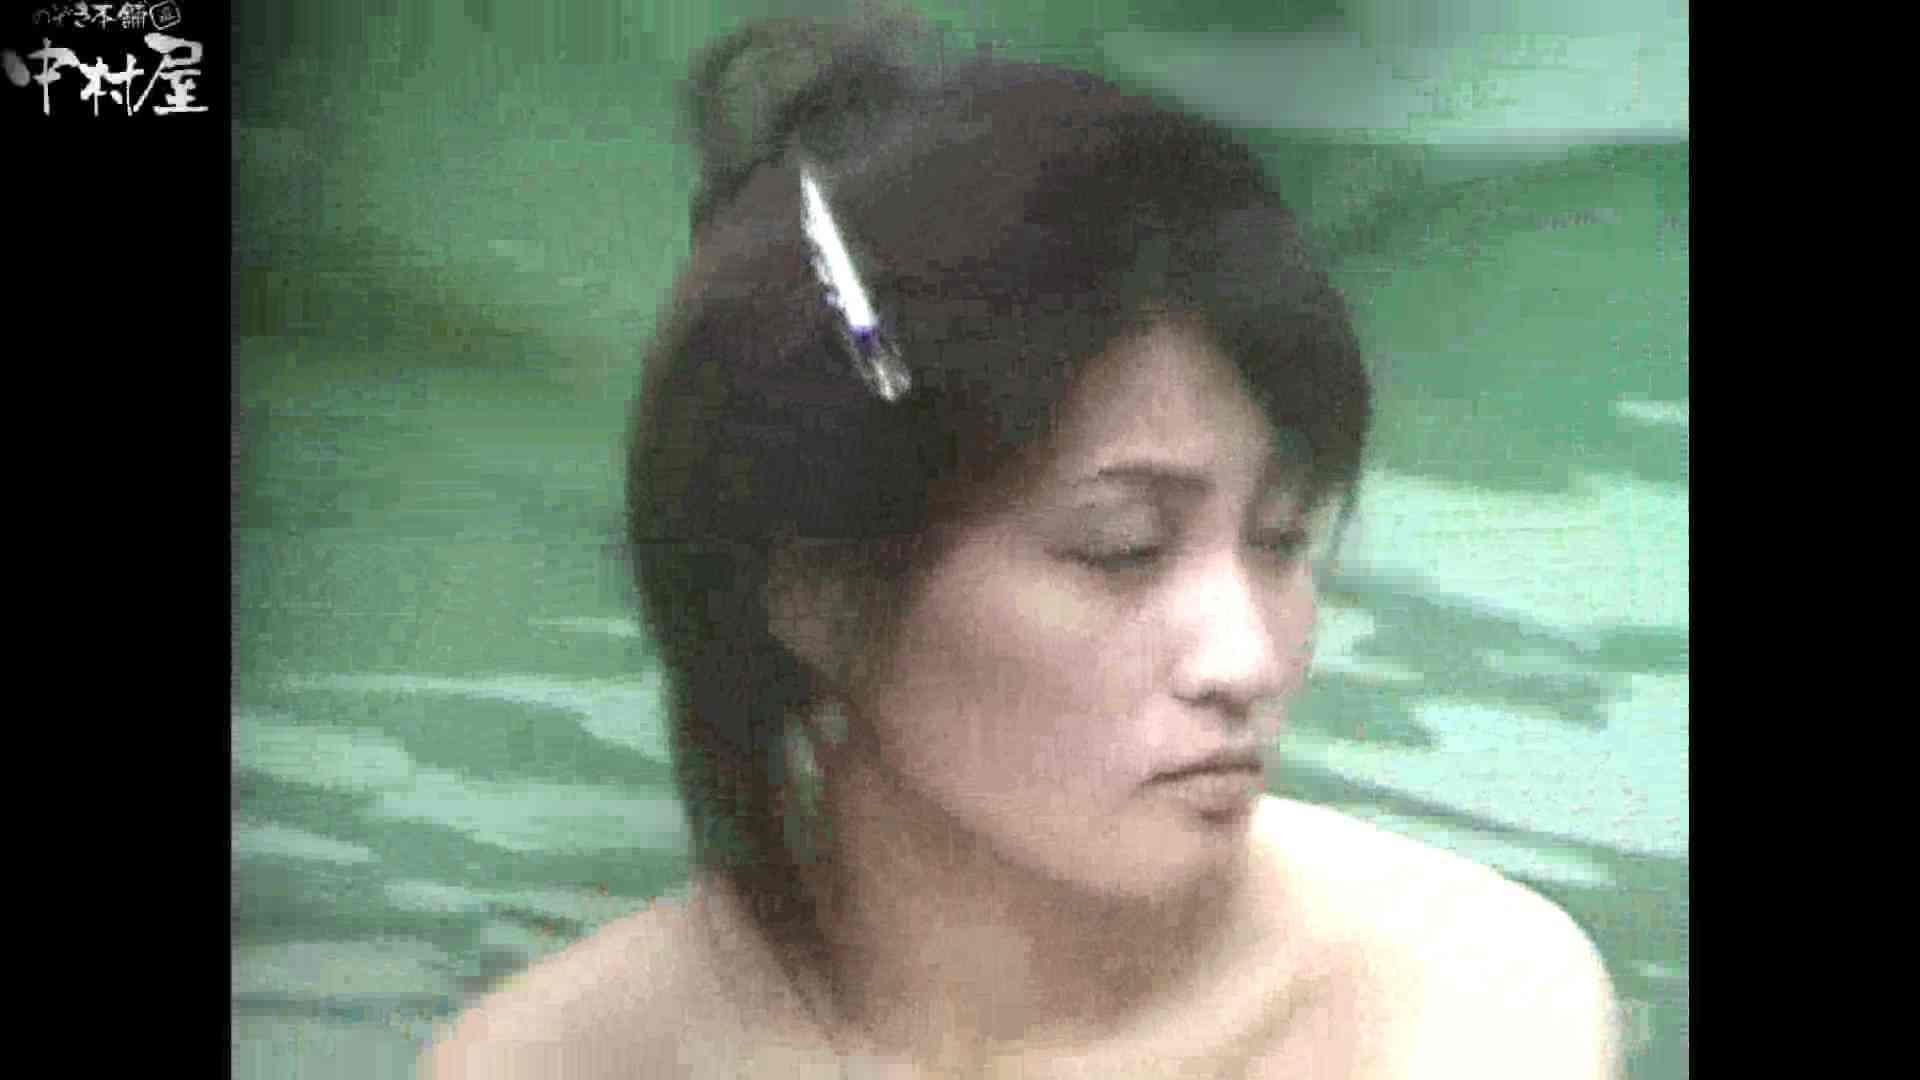 Aquaな露天風呂Vol.867潜入盗撮露天風呂参判湯 其の一 盗撮 | 潜入シリーズ  88pic 37